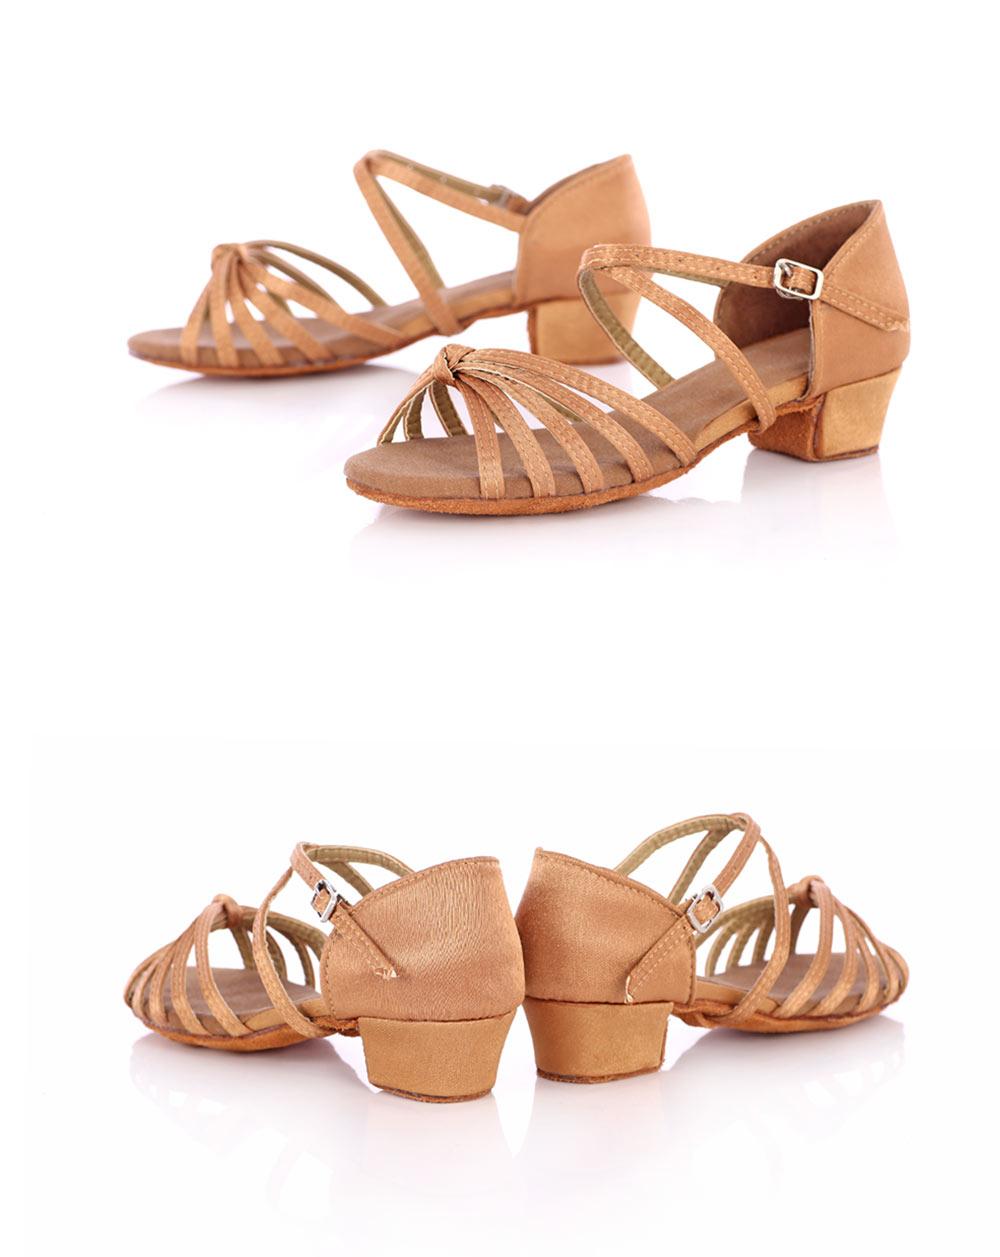 New Arrival Ballroom Tango Latin Dance Shoes High Quality Latin Woman Dancing Shoe Wholesale Women'S Heel Shoes Fast Shipping (12)